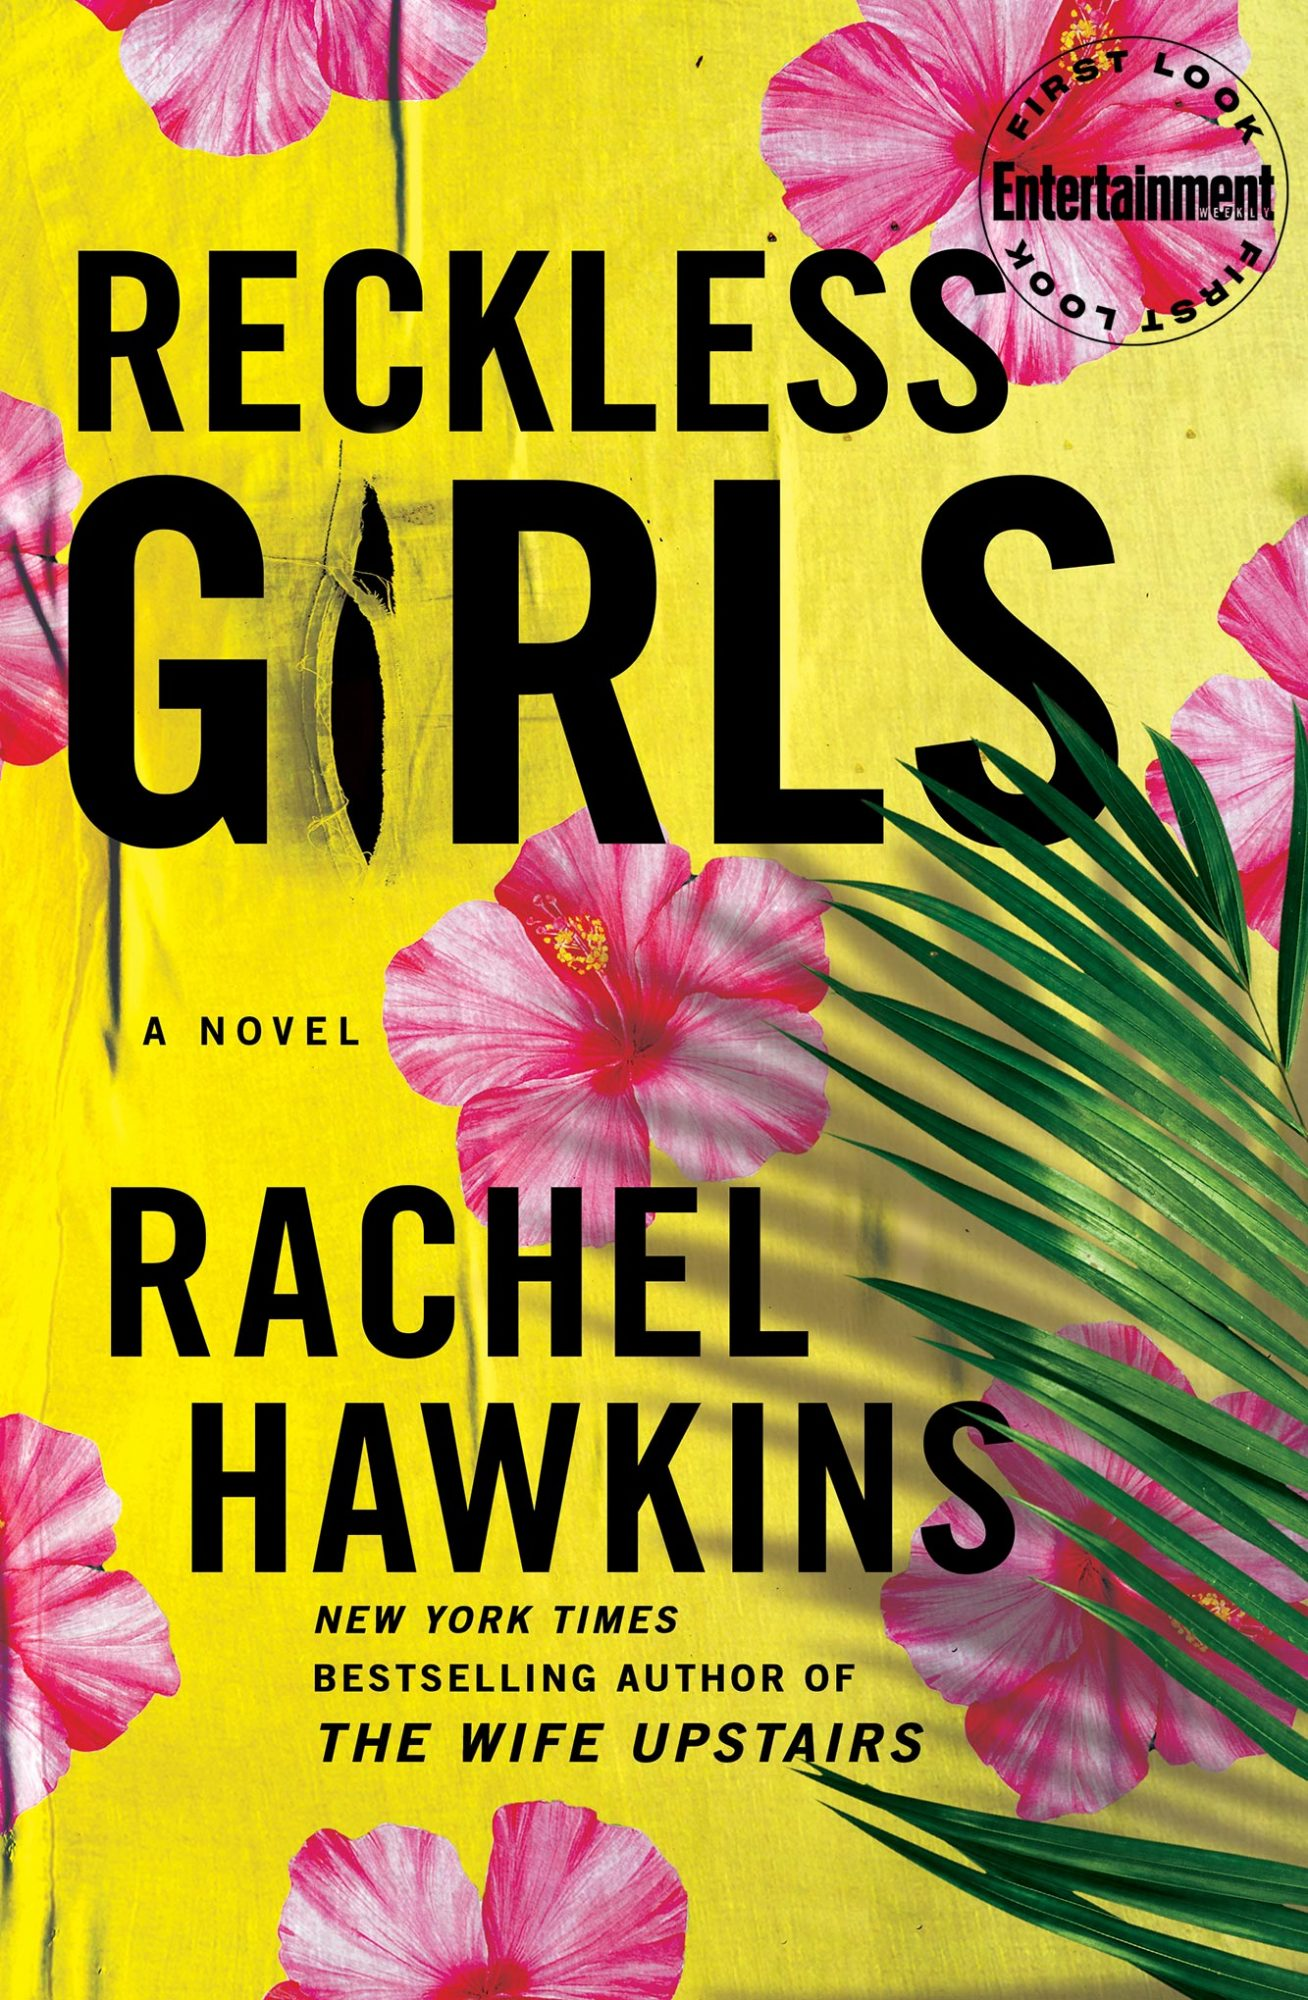 Reckless Girls by Rachel Hawkins